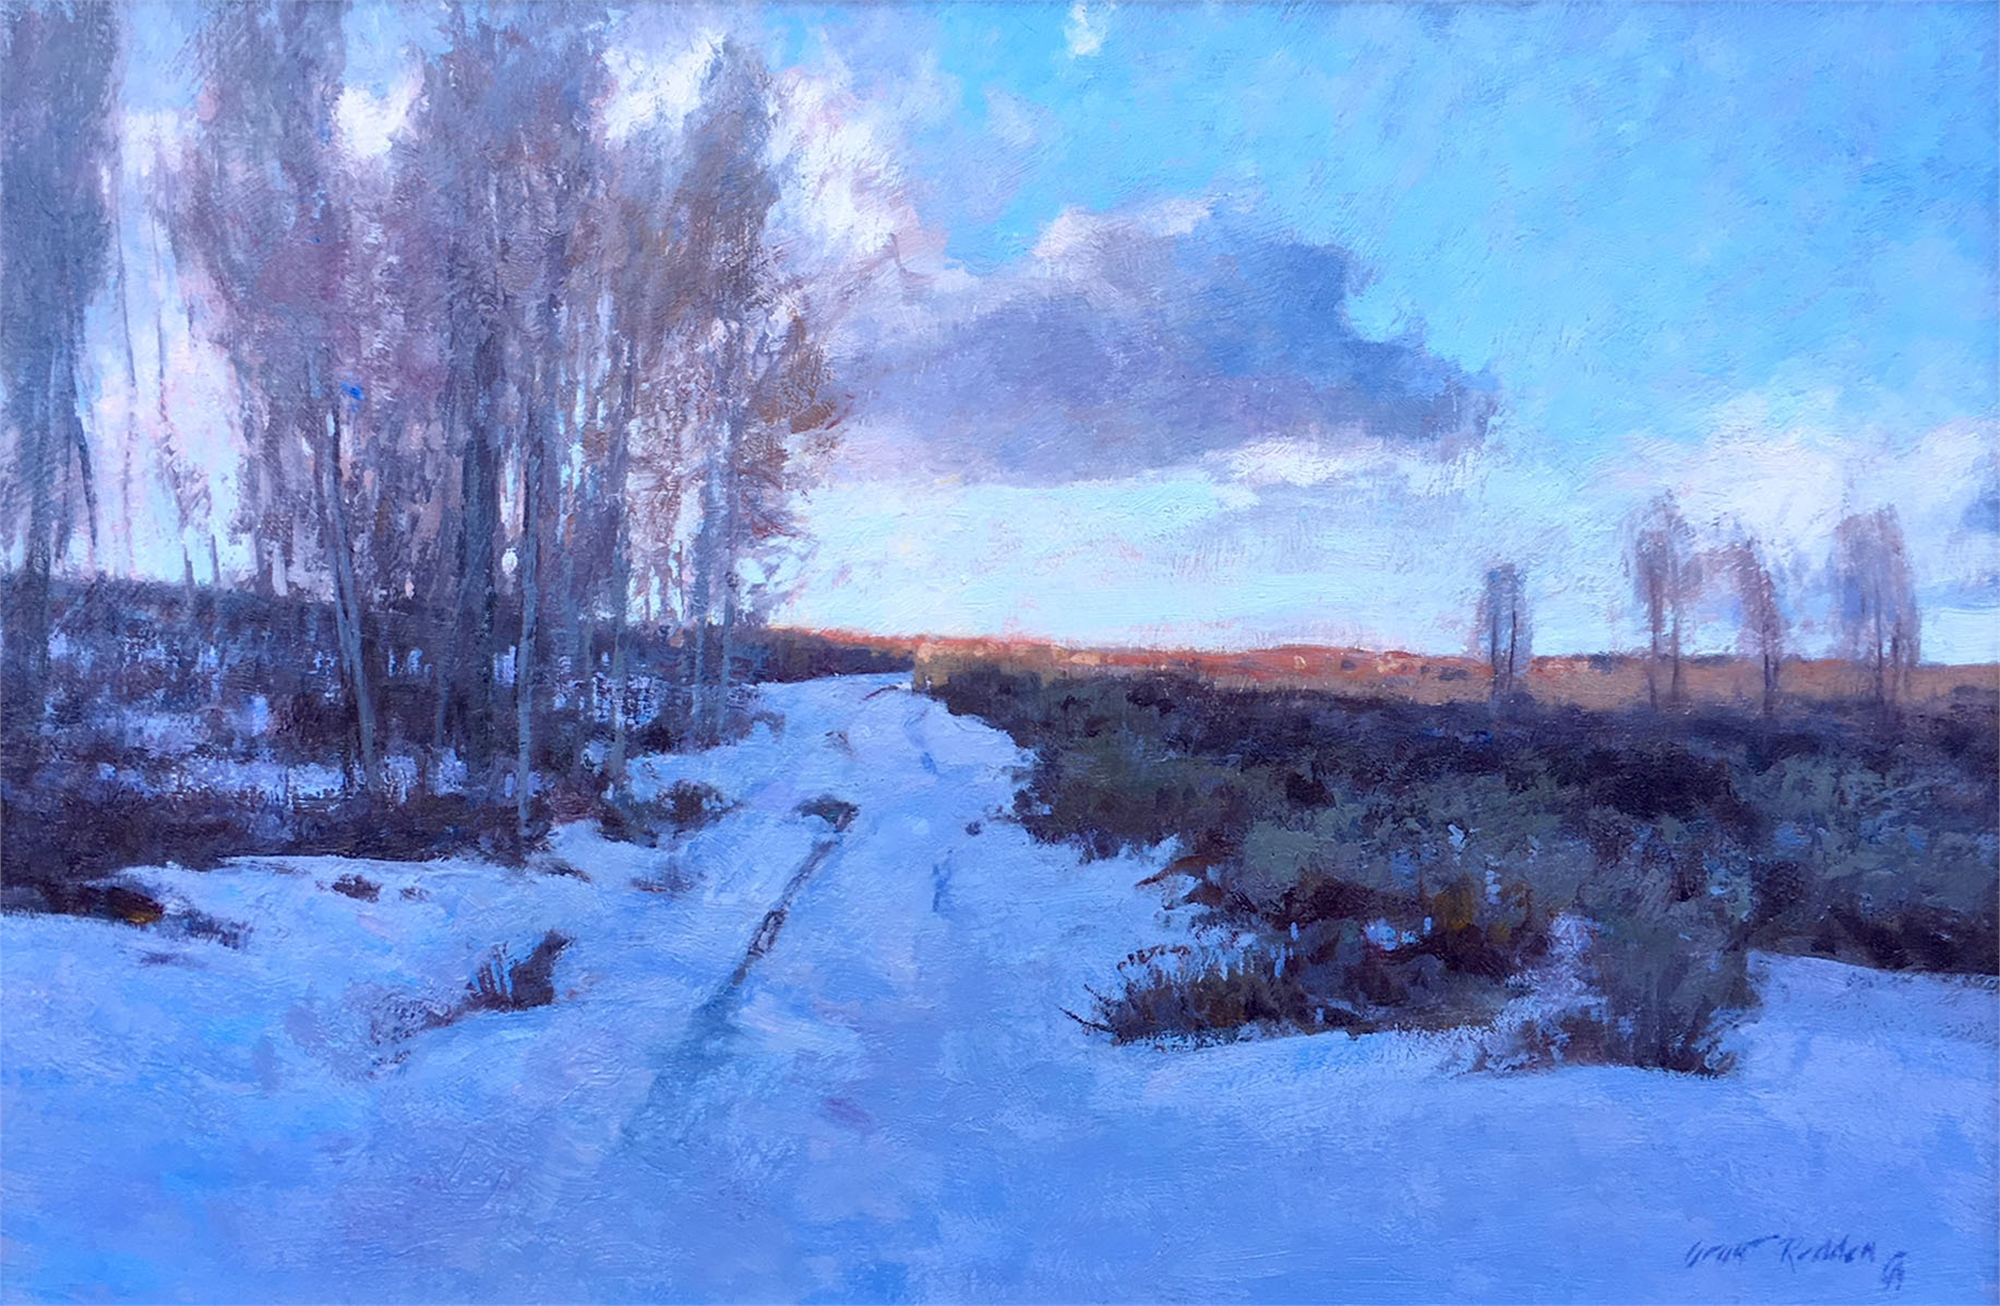 December Evening by Grant Redden